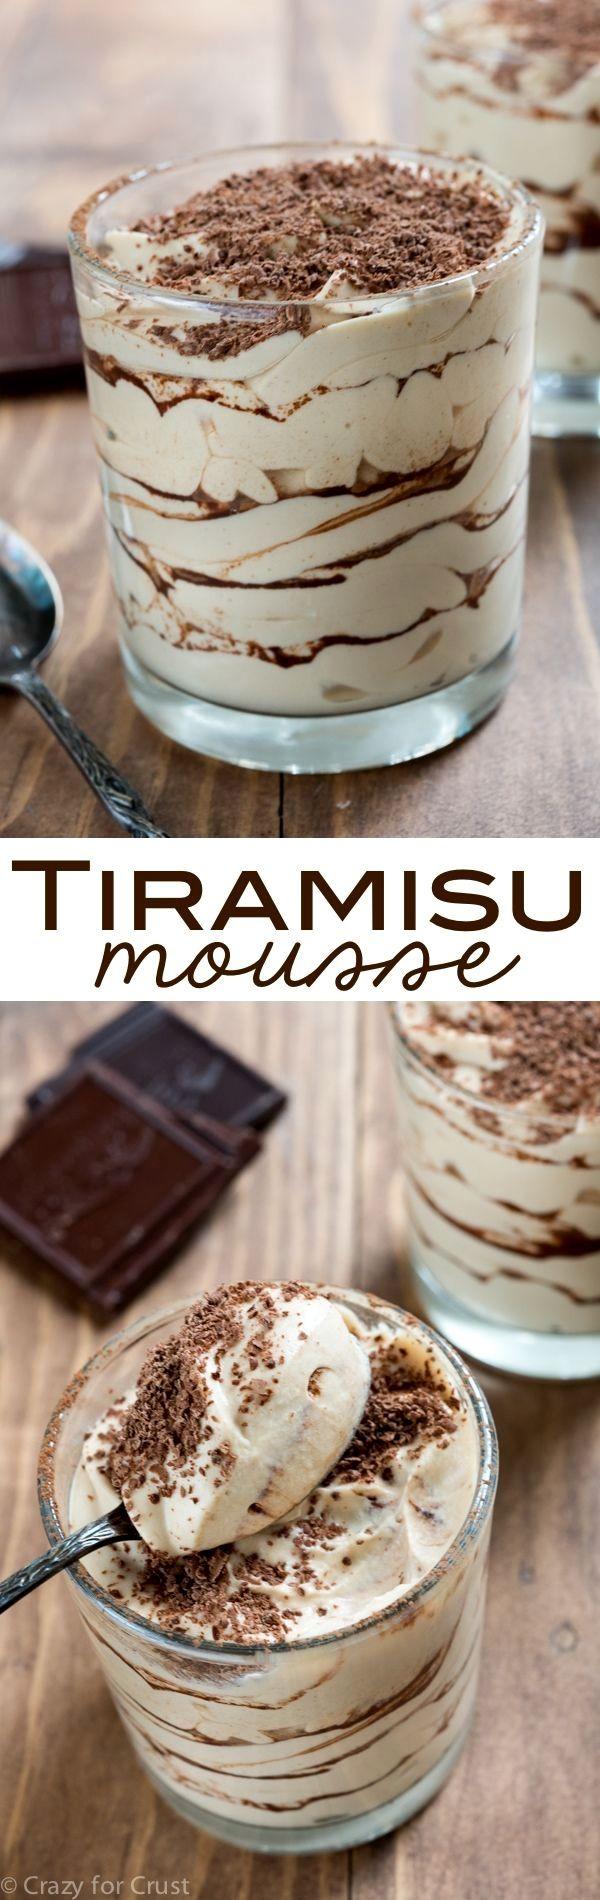 Tiramisu Mousse: an easy no-bake dessert! Layers of tiramisu whipped cream and cocoa powder for the best part of the tiramisu!